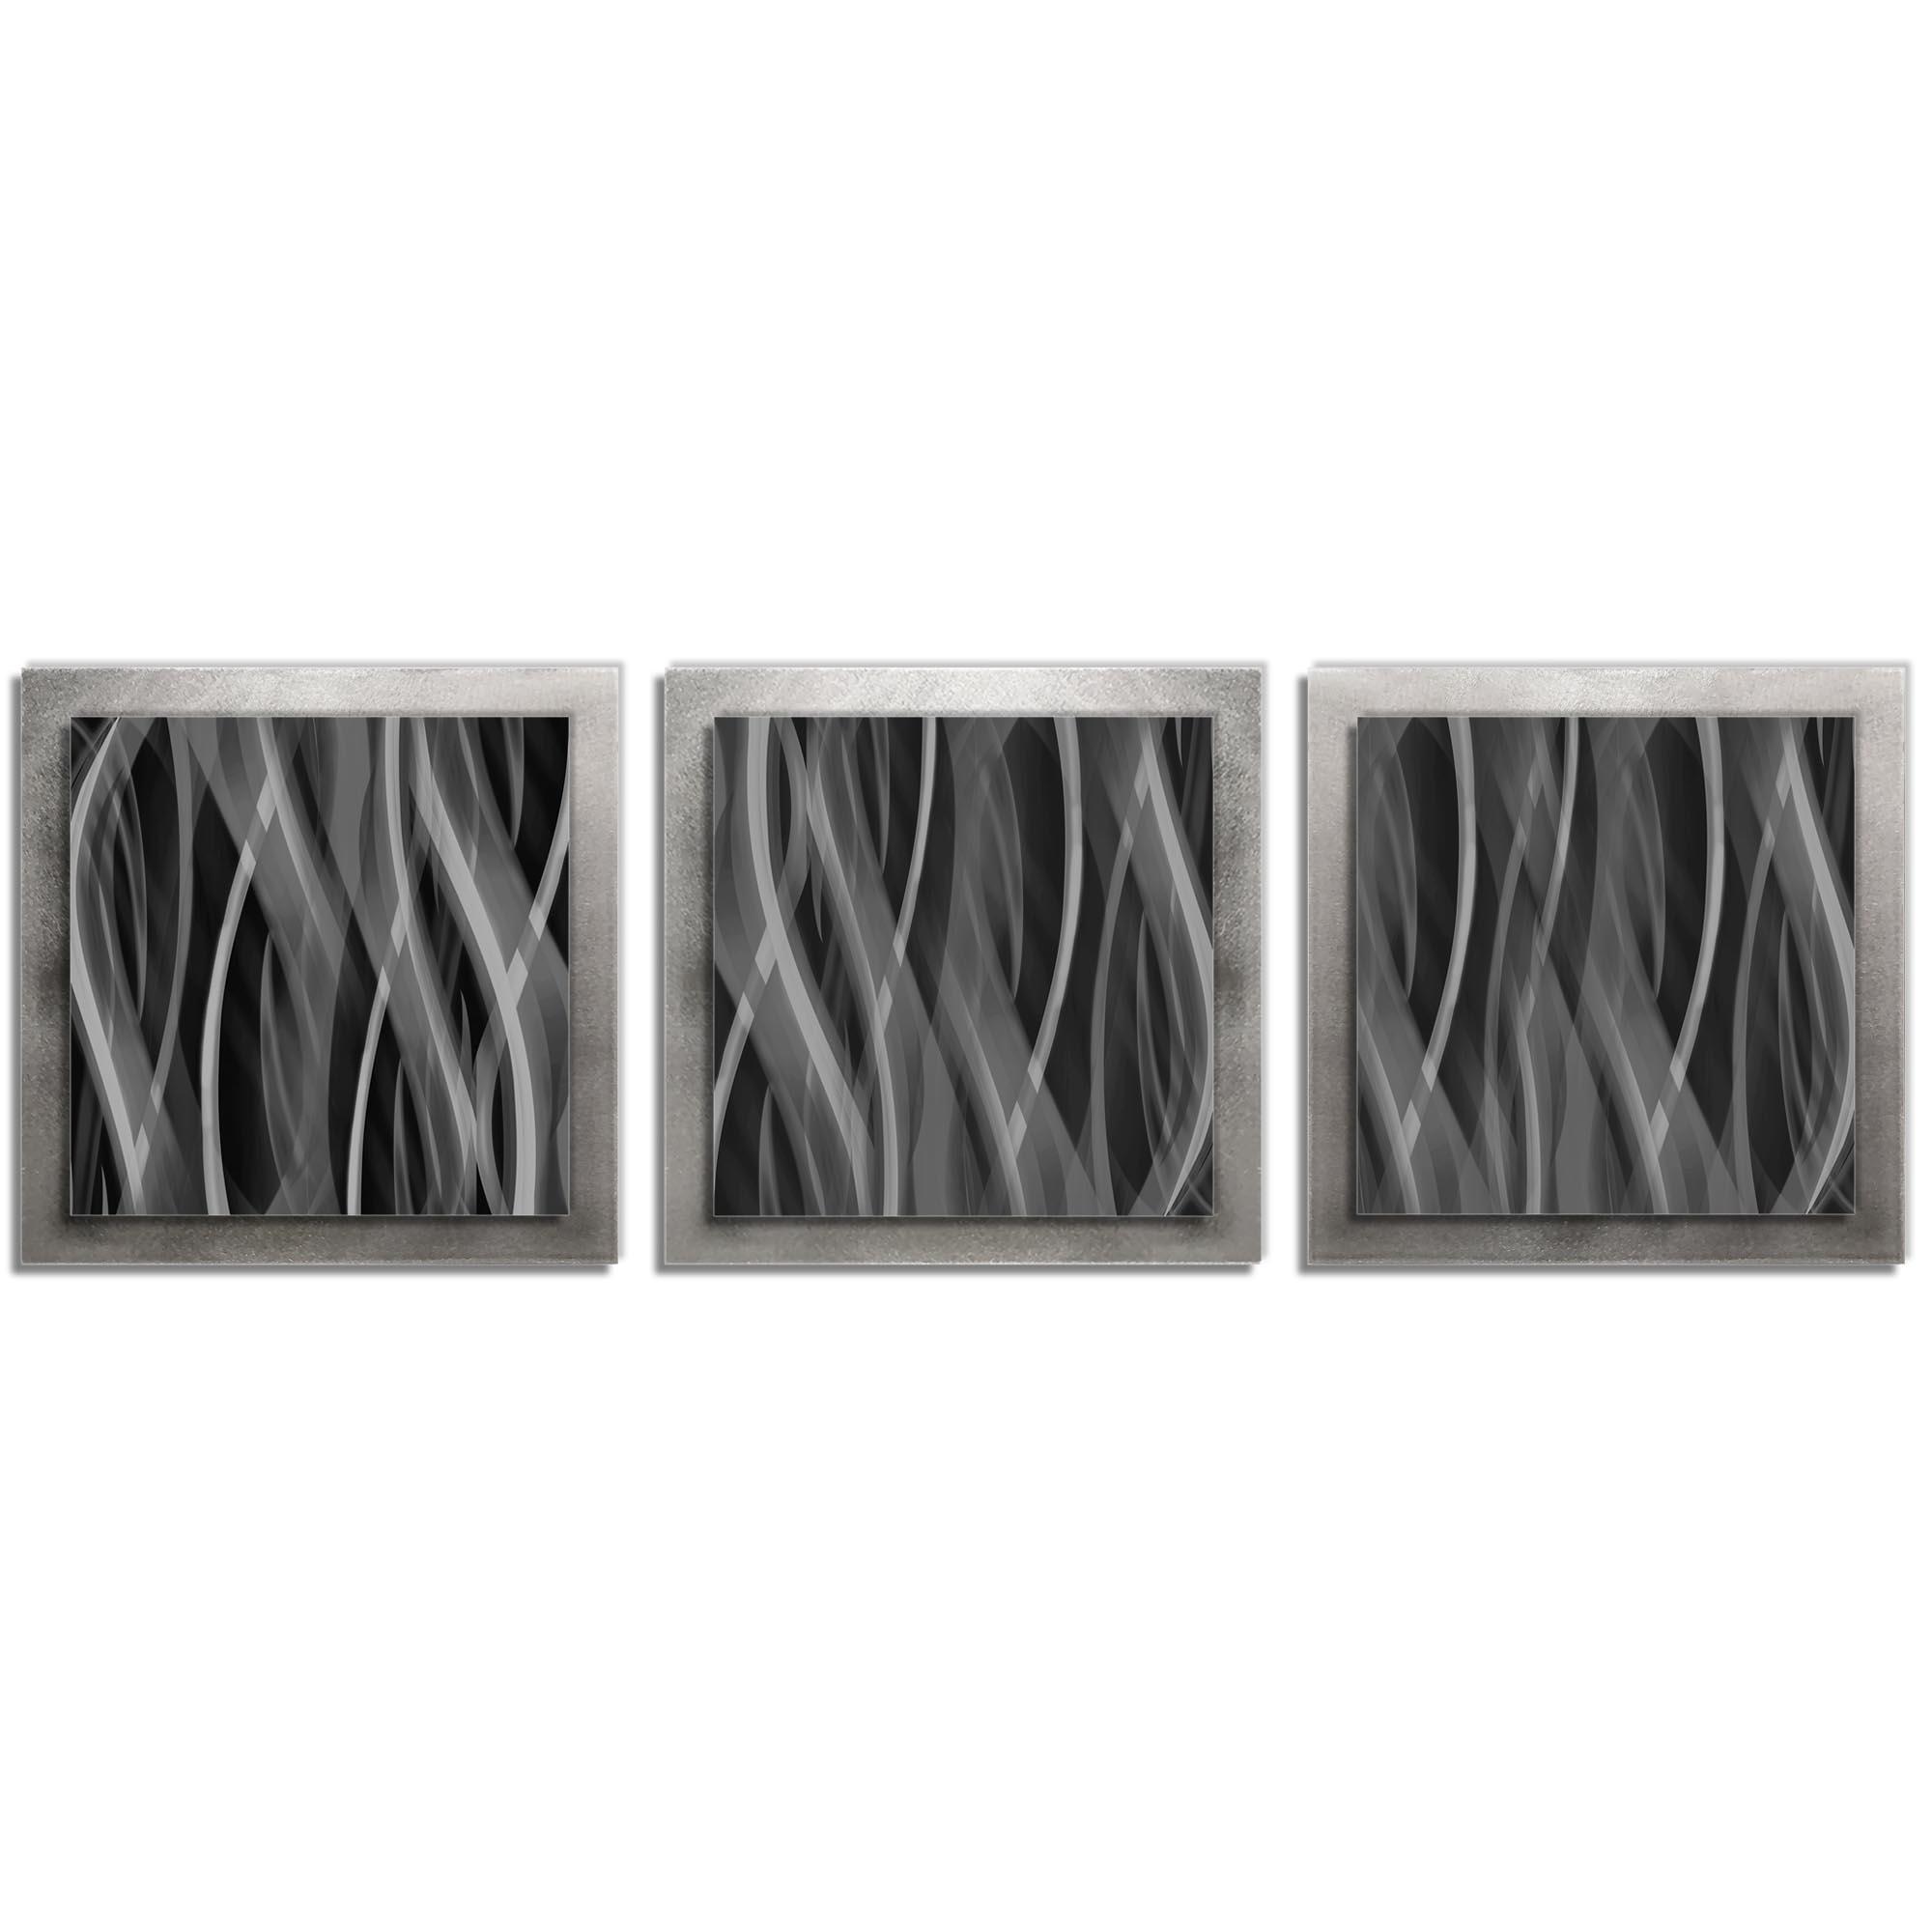 Pewter Essence - Layered Modern Metal Wall Art